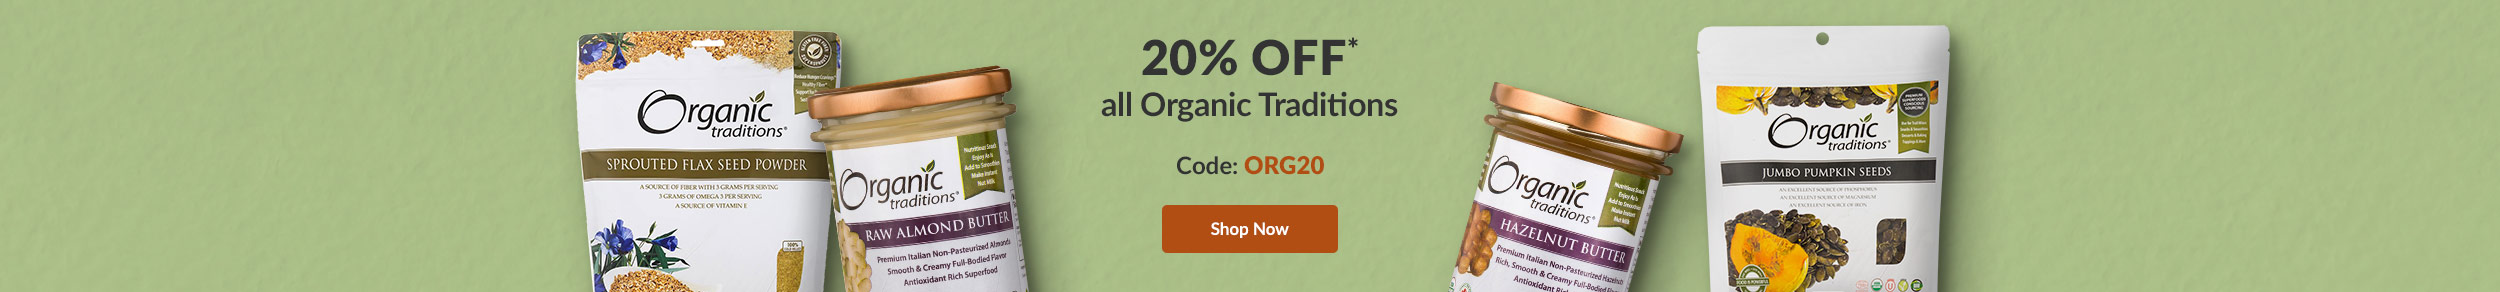 https://i3.pureformulas.net/images/static/Organic_Traditions_Food_Store_010120.jpg